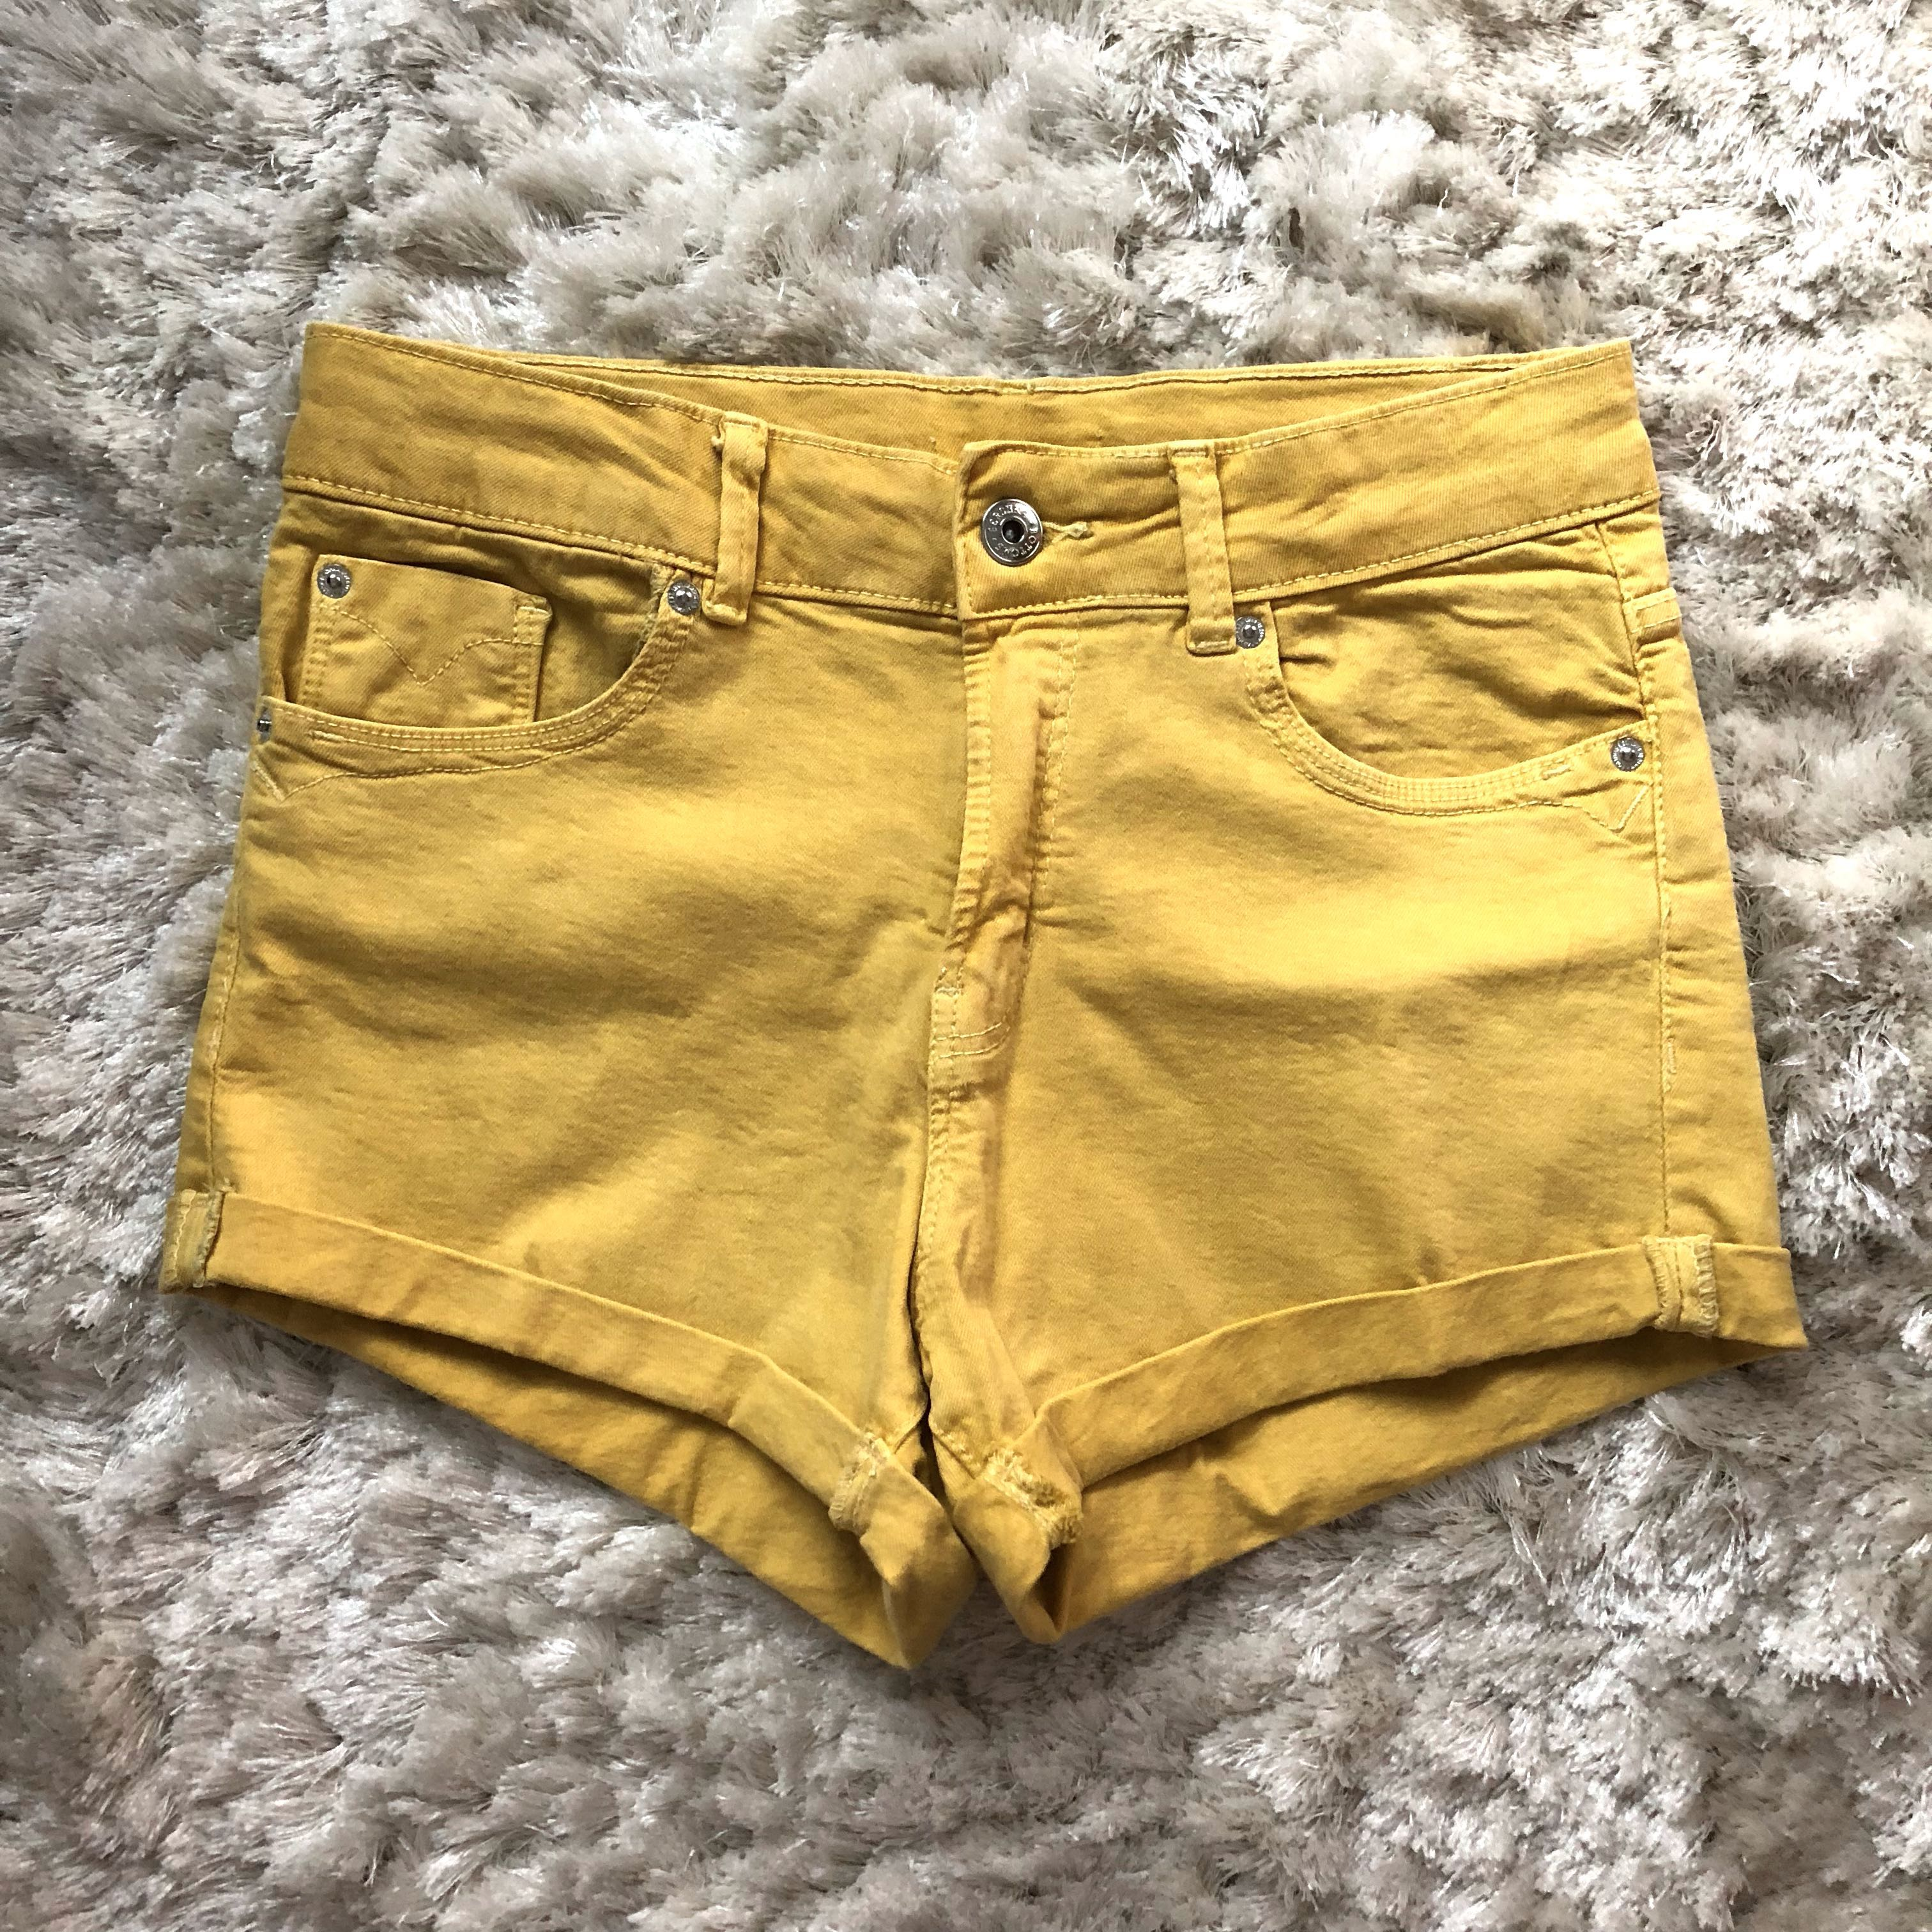 28bc3dcca8 ✨[NEW] FREE NM✨ Bershka Womens High Waisted Denim Shorts - Mustard ...